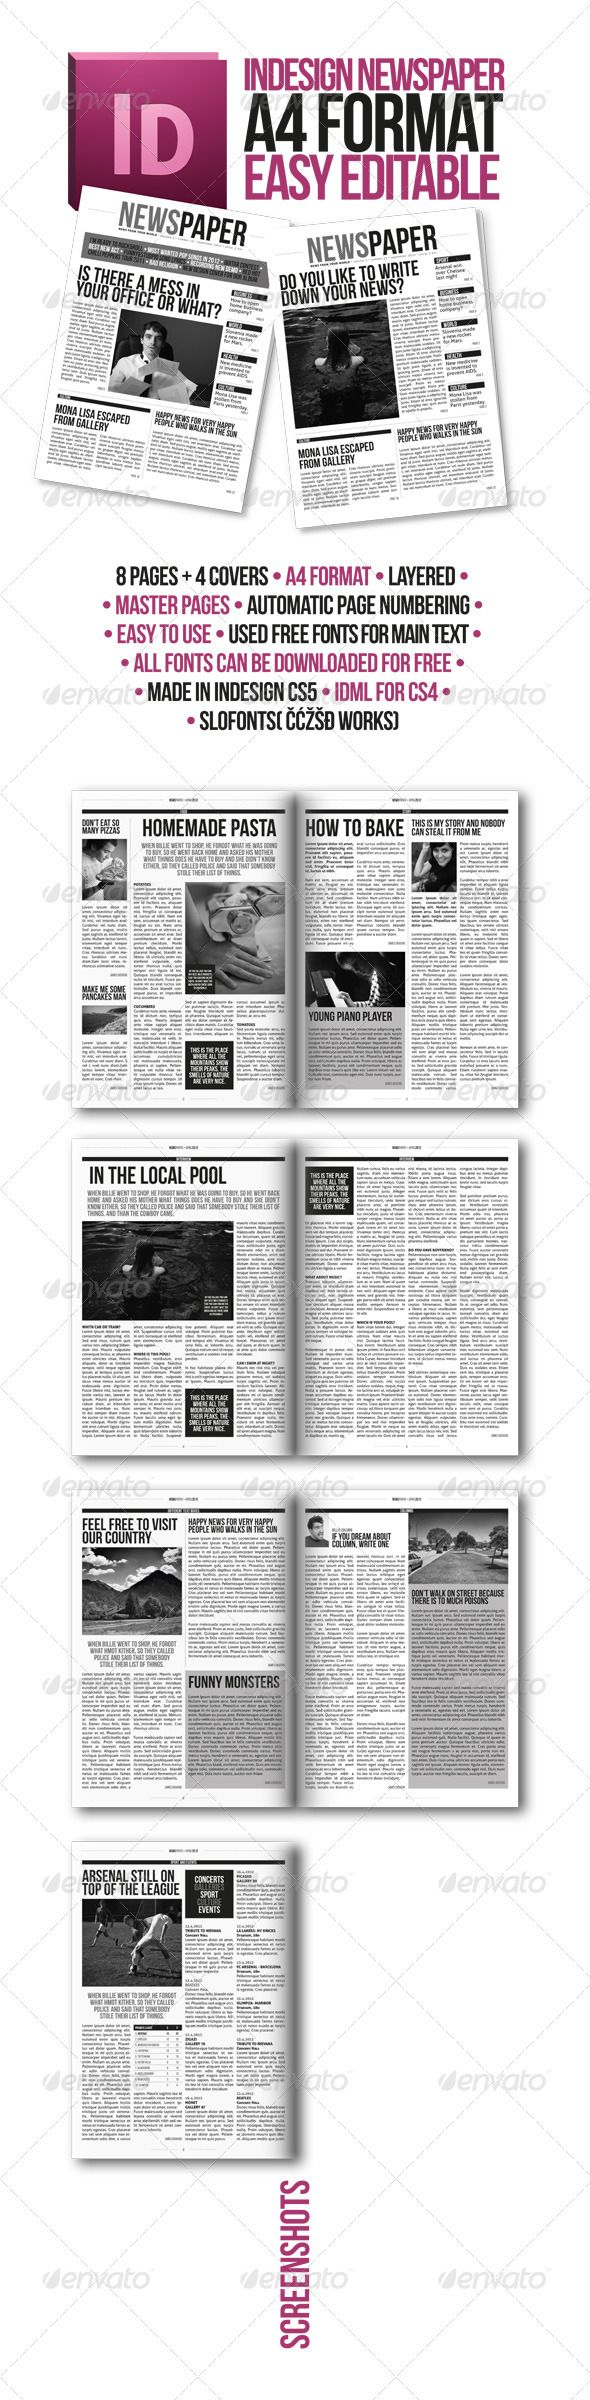 magazine article templates